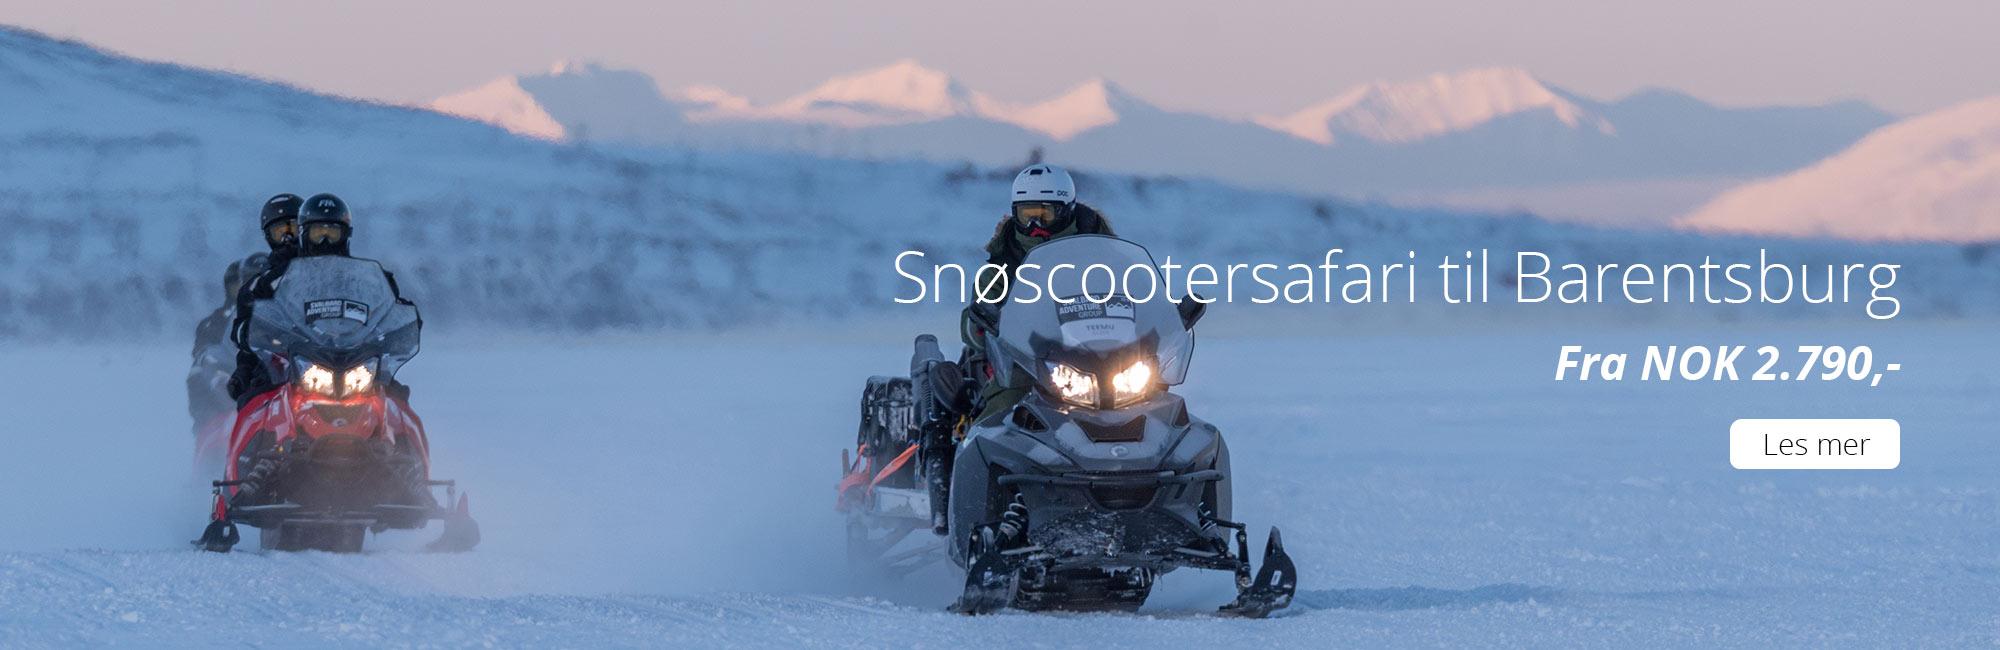 Snøscootersafari til Barentsburg